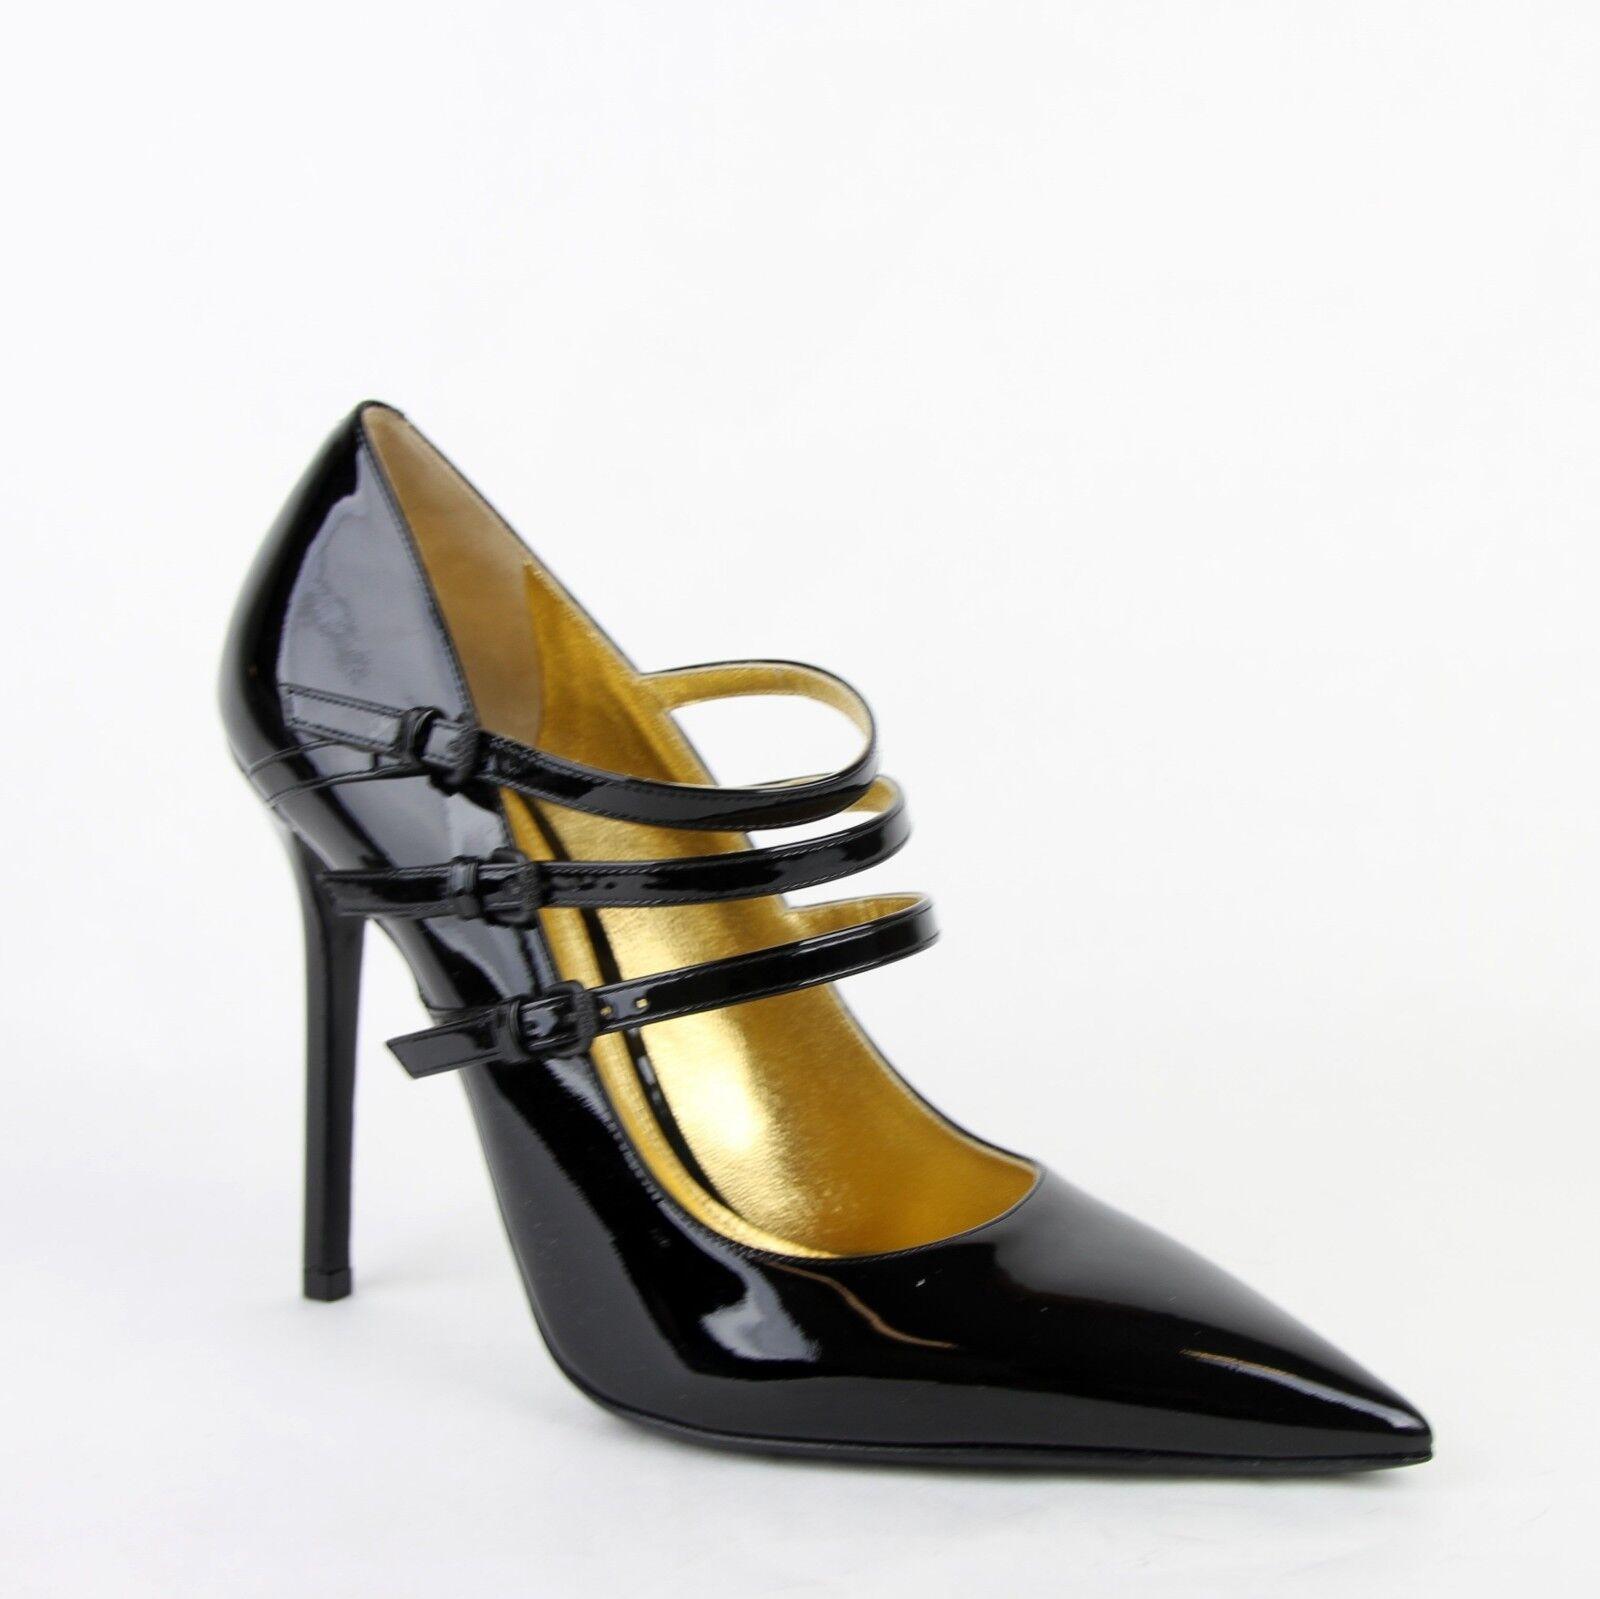 740 Bottega Veneta Women Black Patent Leather 3 Straps Heels 40 10 443156 1000